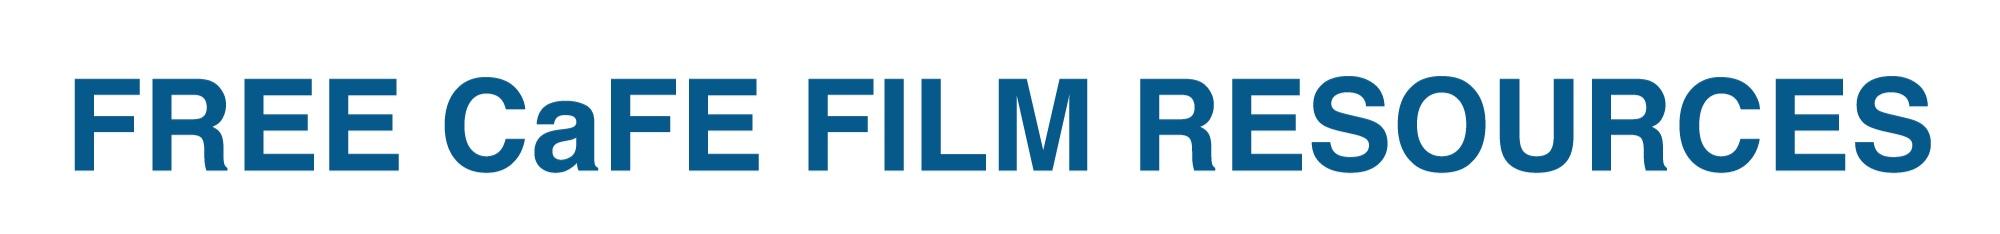 FREE+CaFE+FILM+RESOURCES.jpg